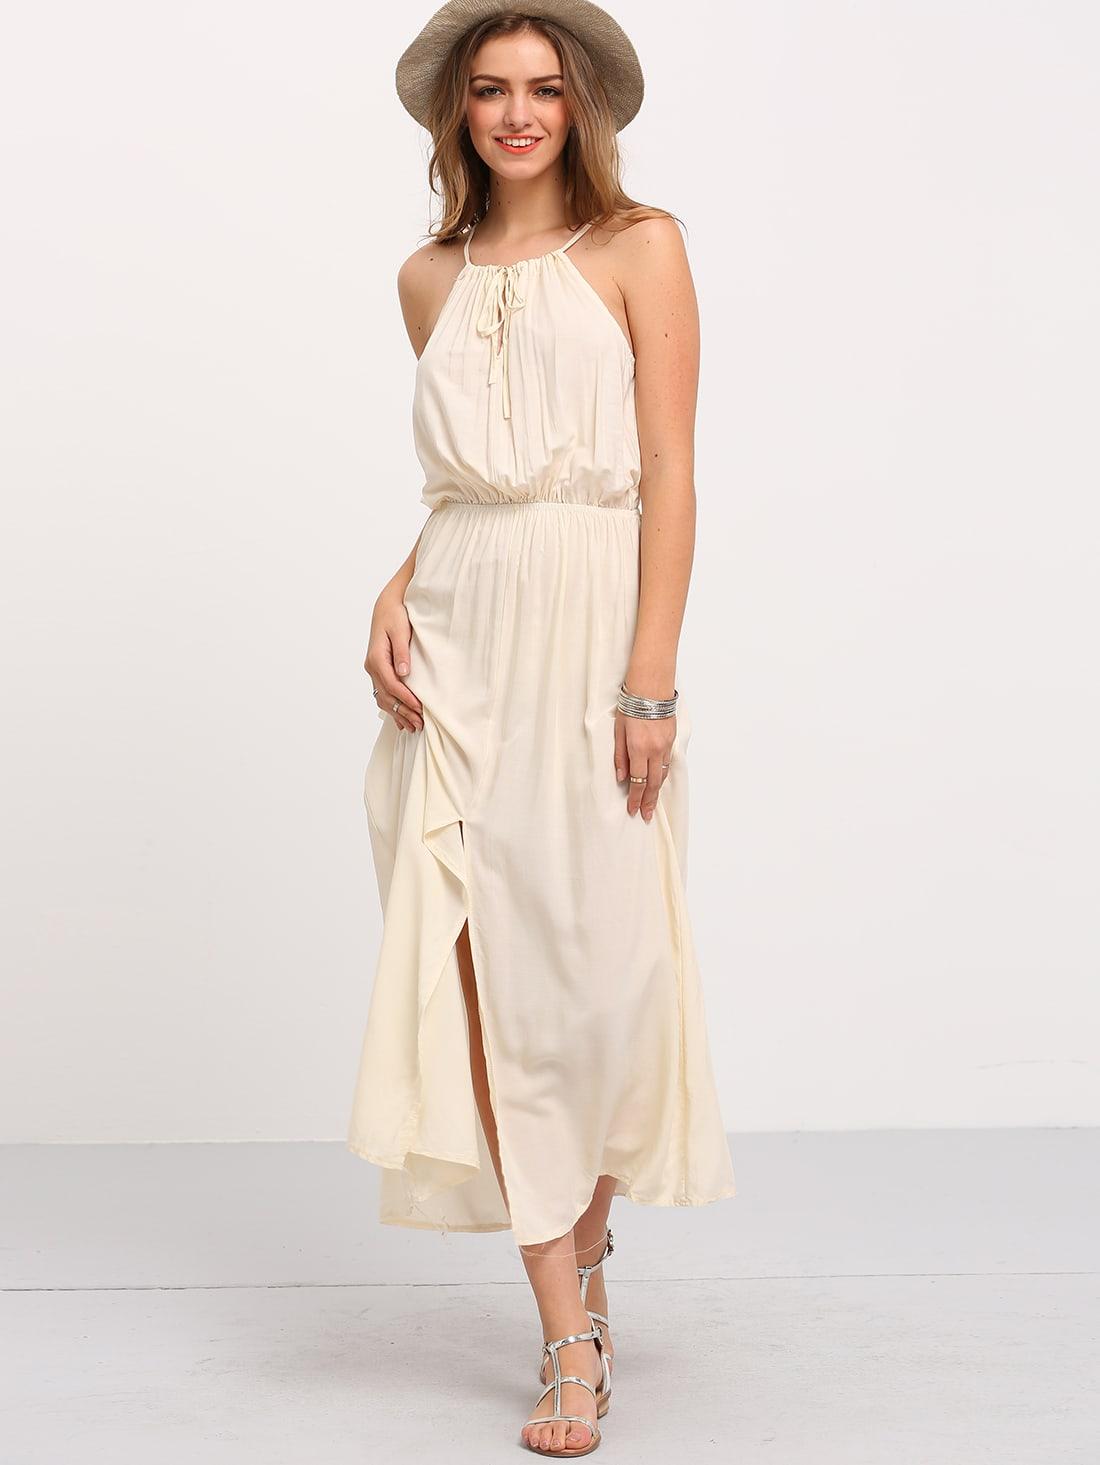 White Sleeveless V Cut Dress